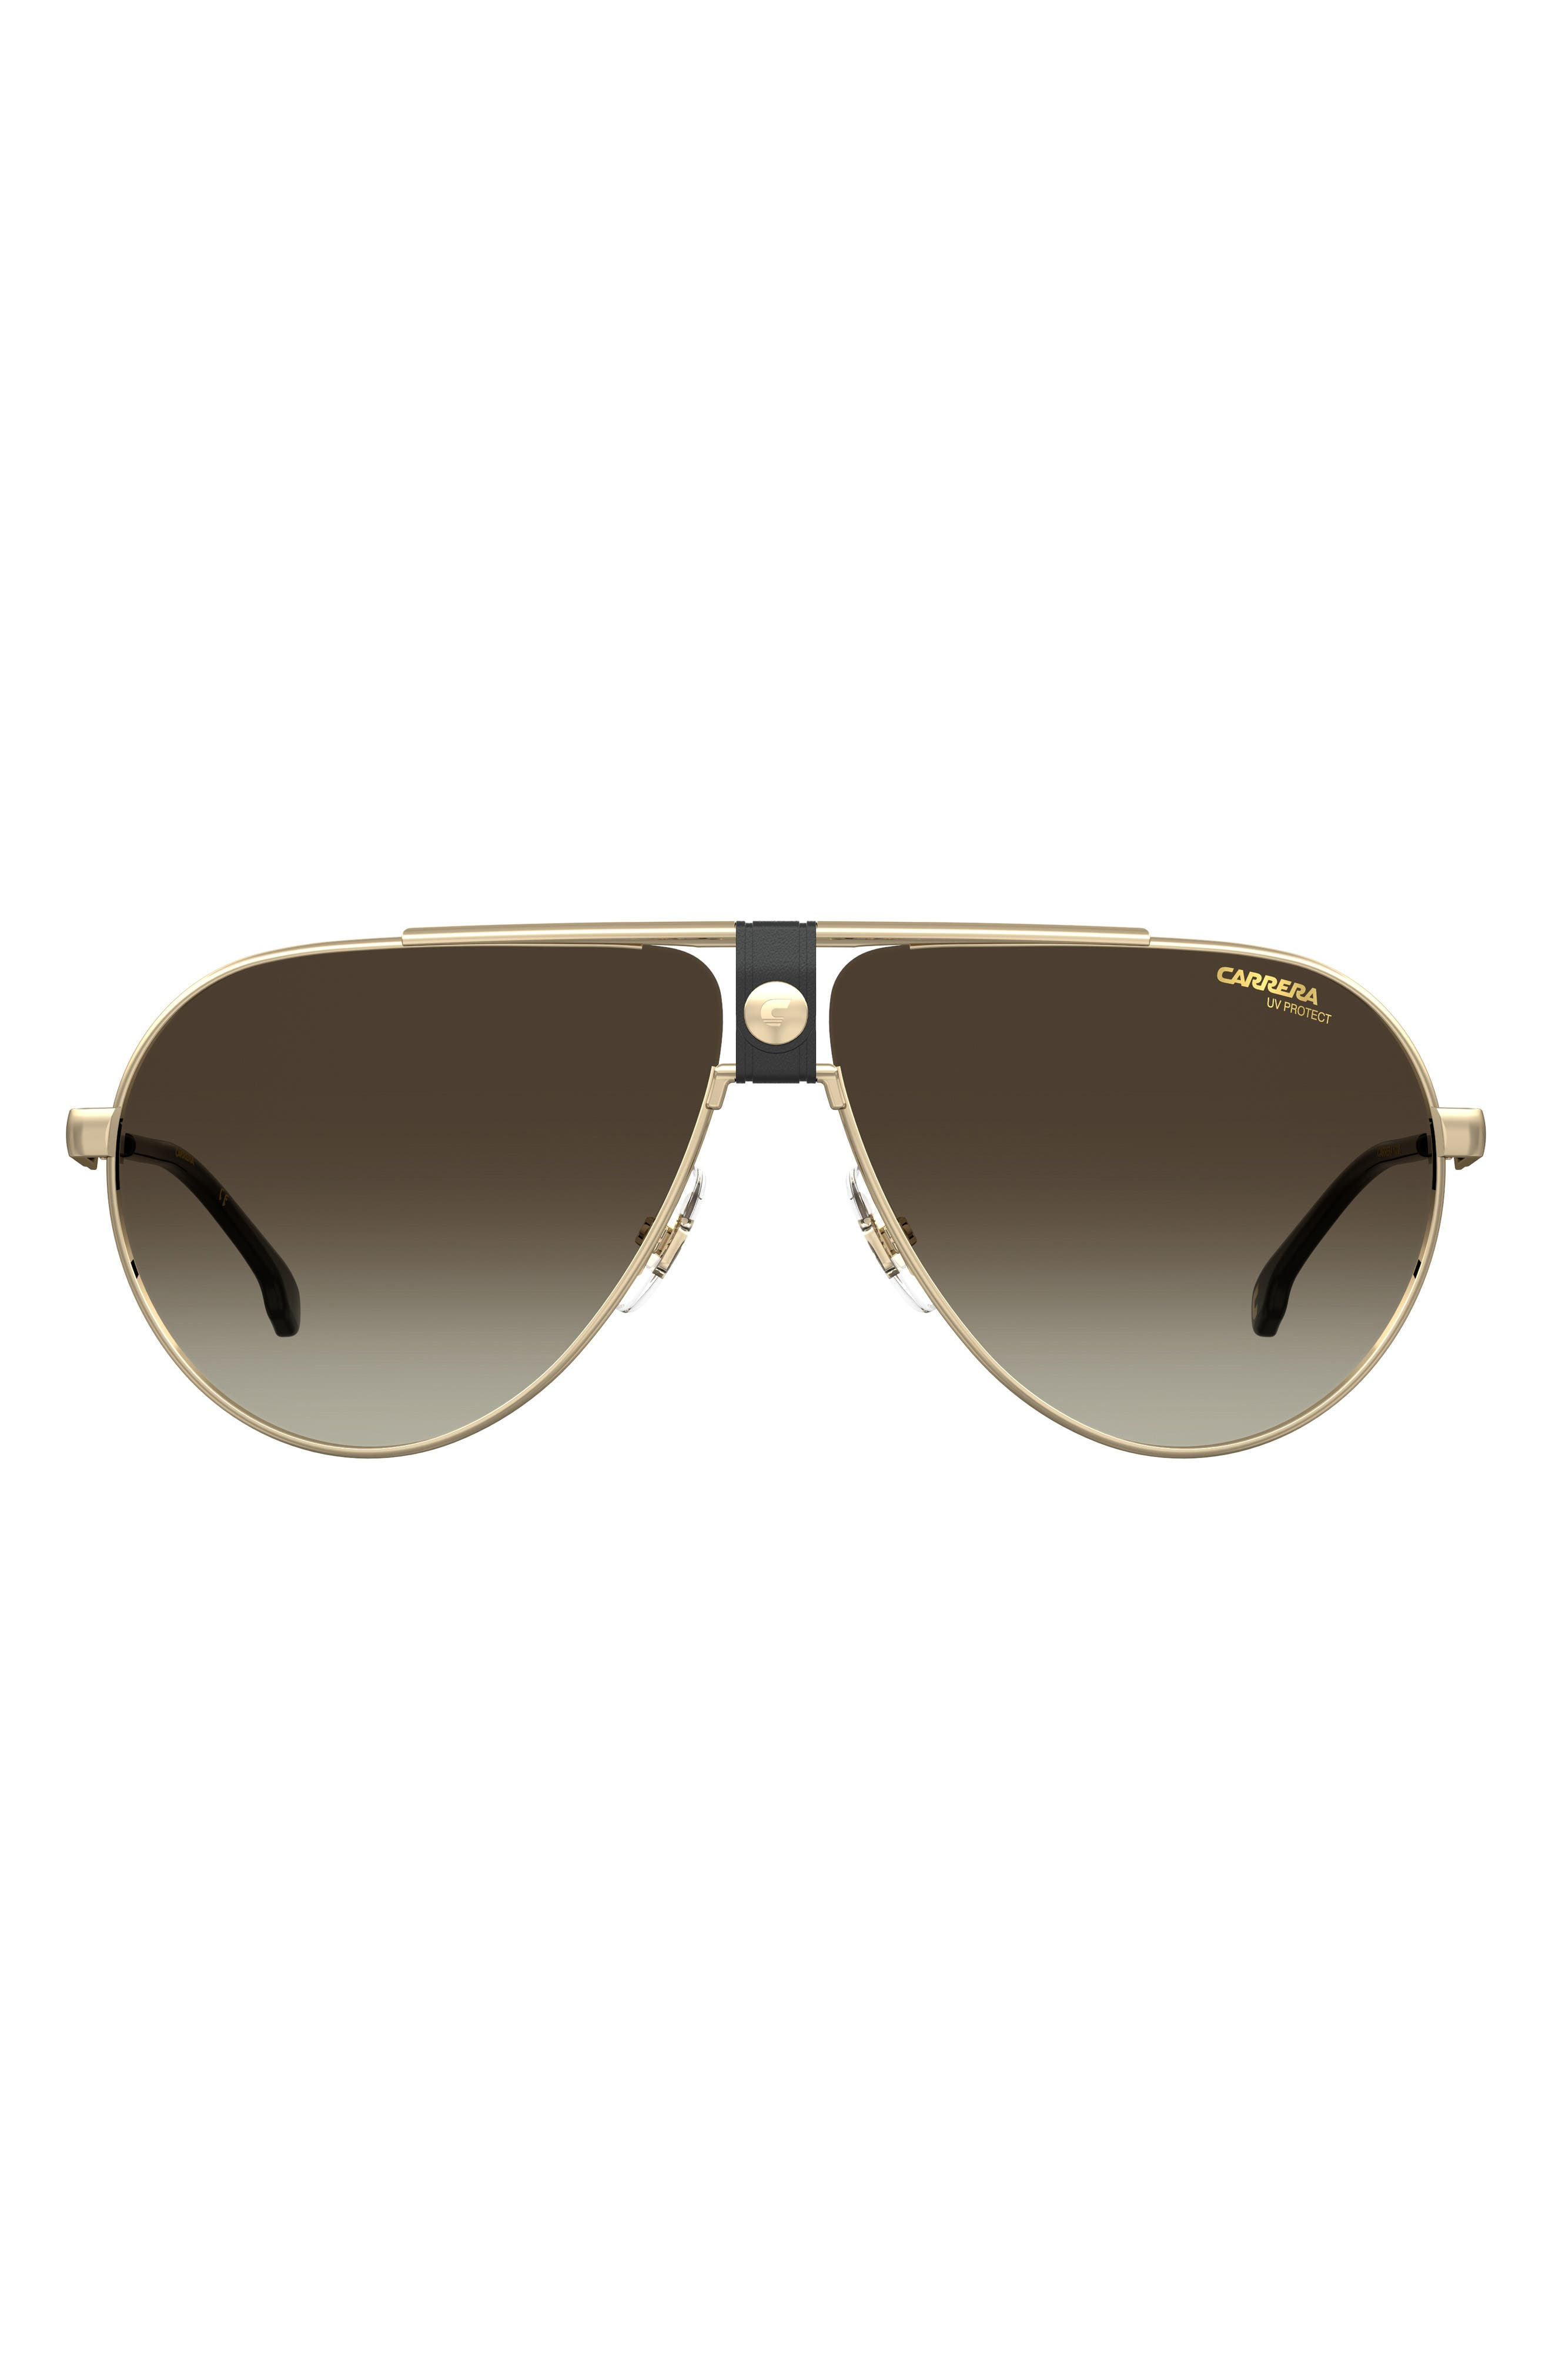 63mm Oversize Gradient Aviator Sunglasses